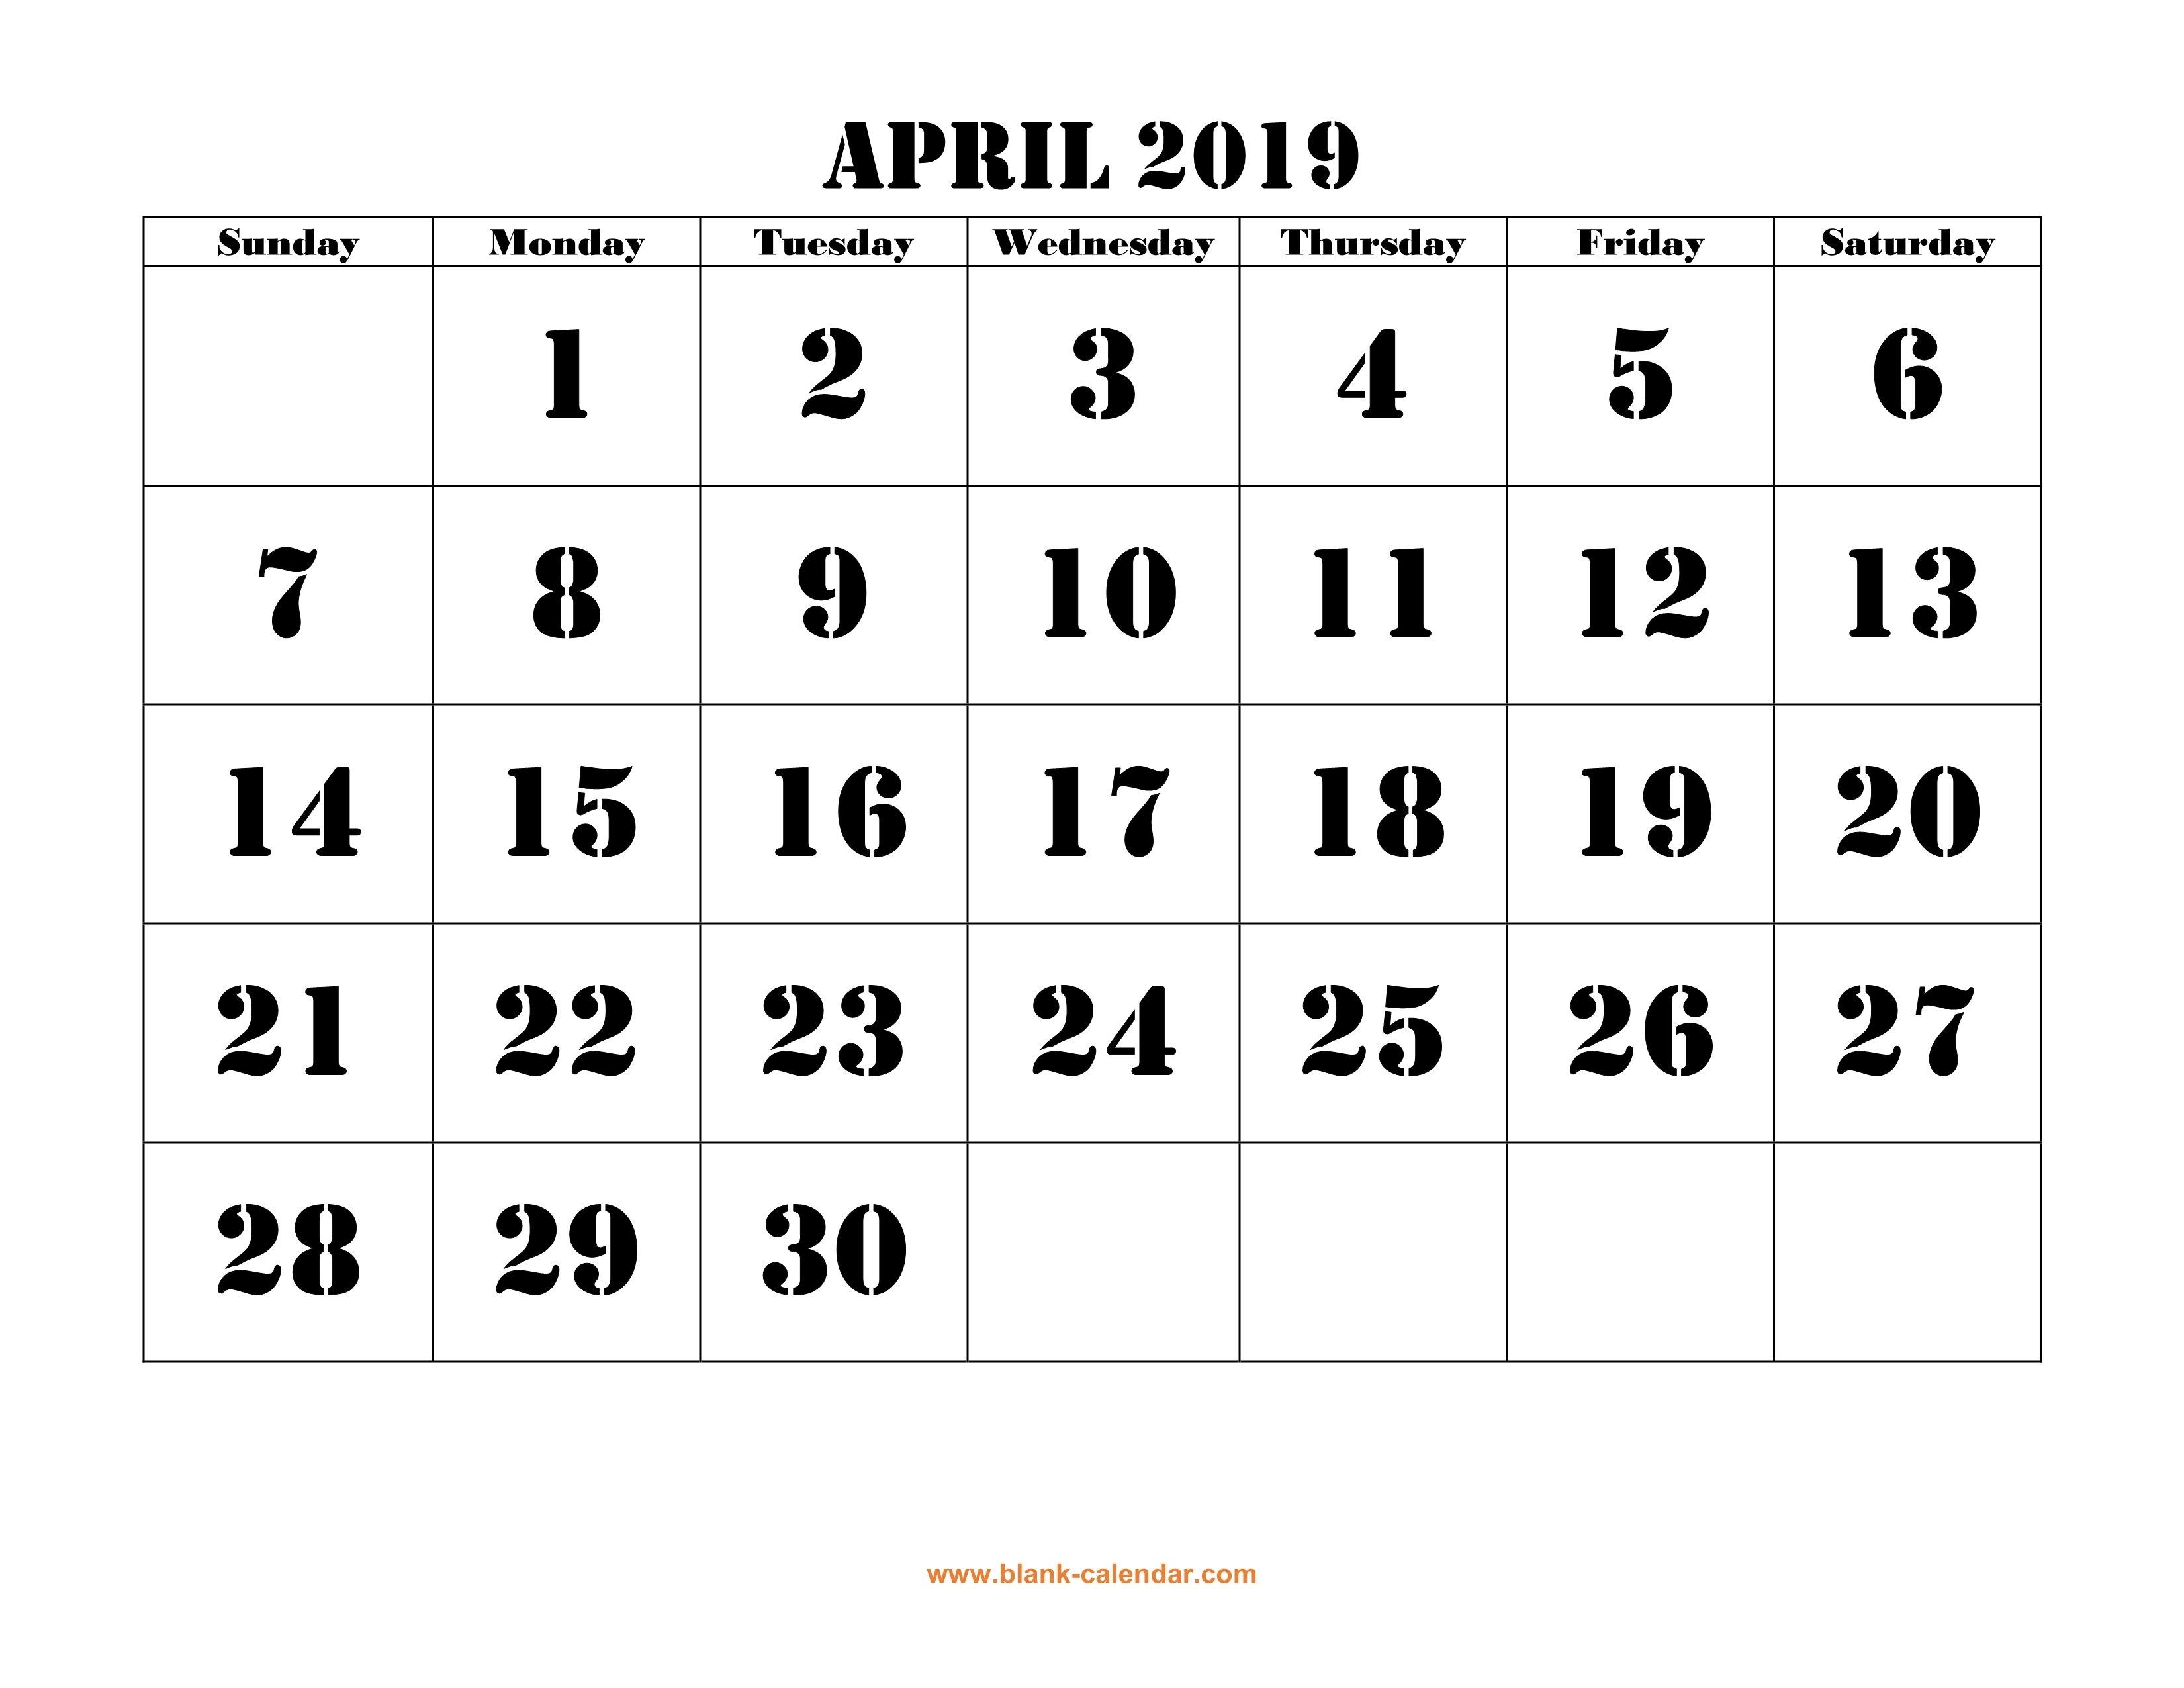 Free Download Printable April 2019 Calendar, Large Font Design Calendar April 30 2019